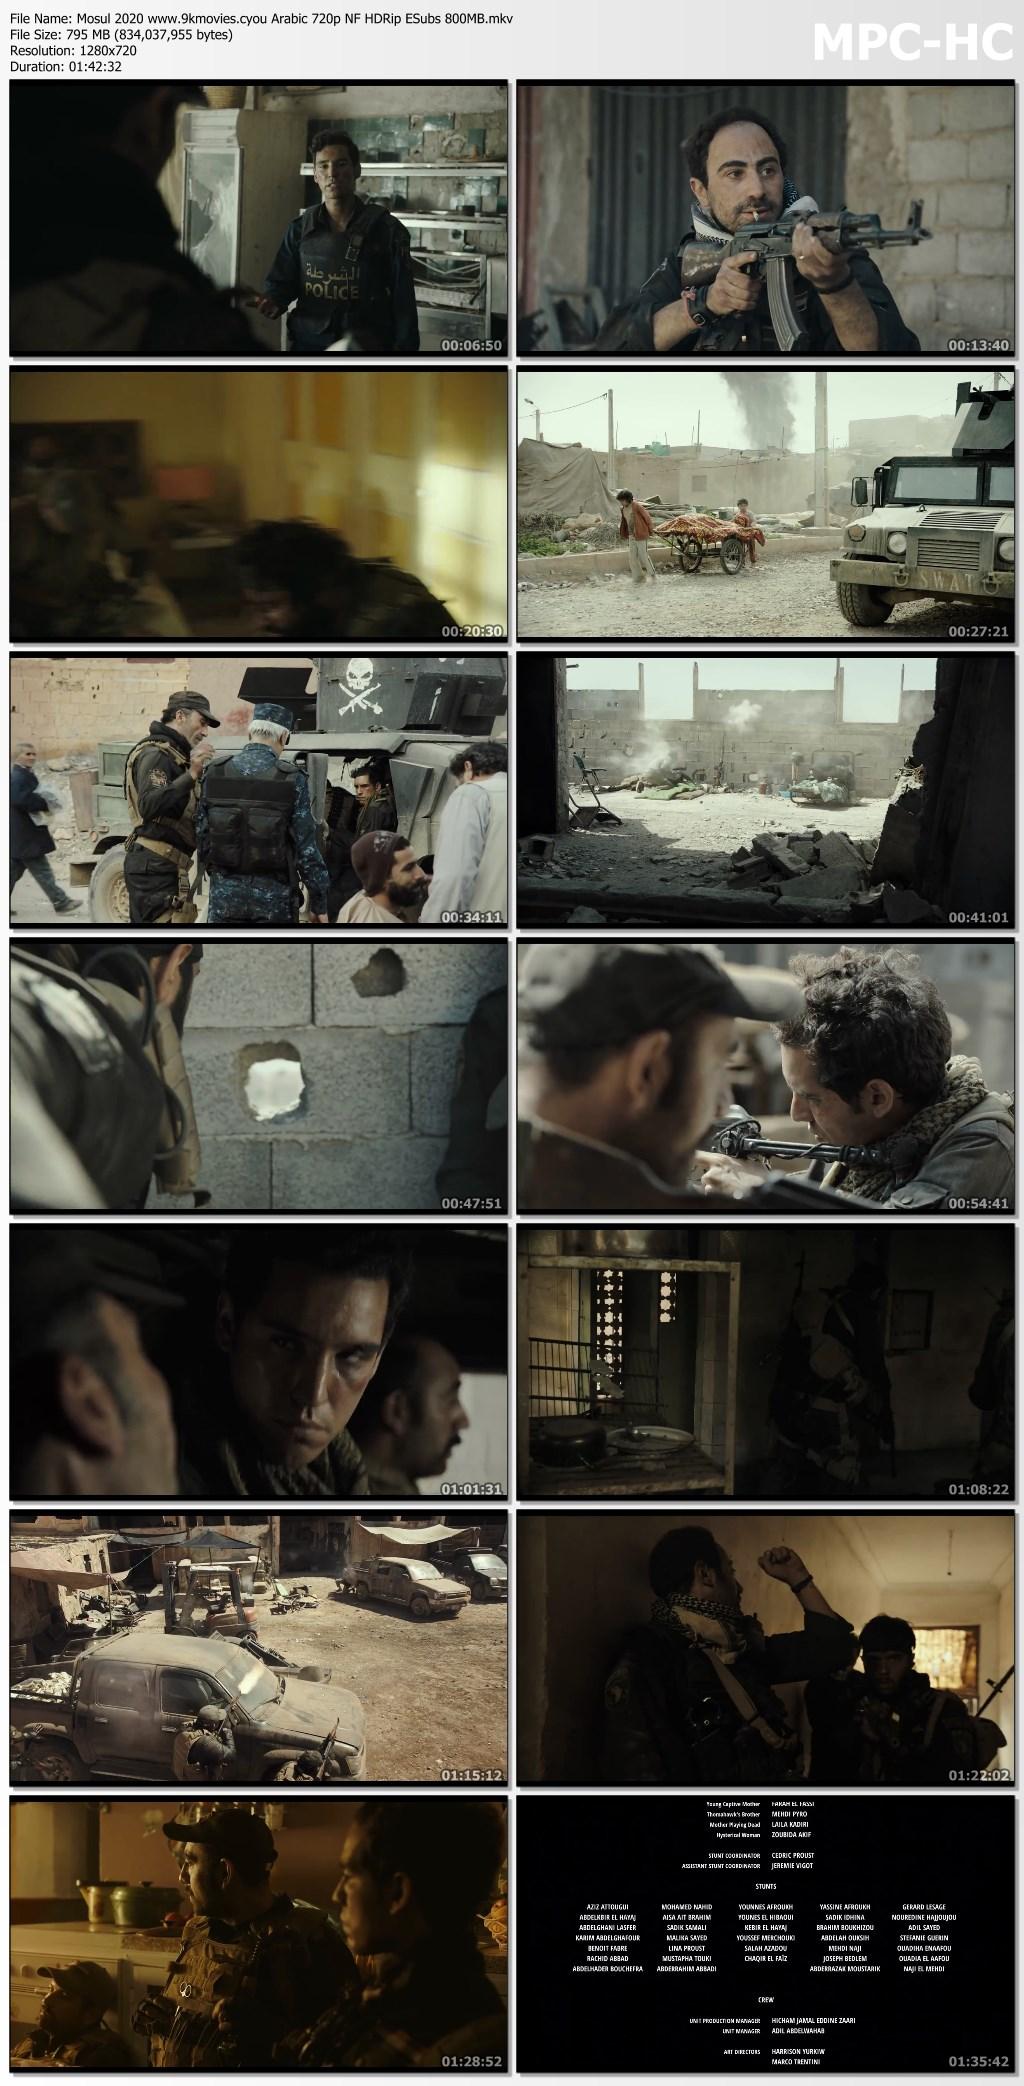 Mosul 2020 Arbic 720p Netflix HDRip ESub 795MB Download